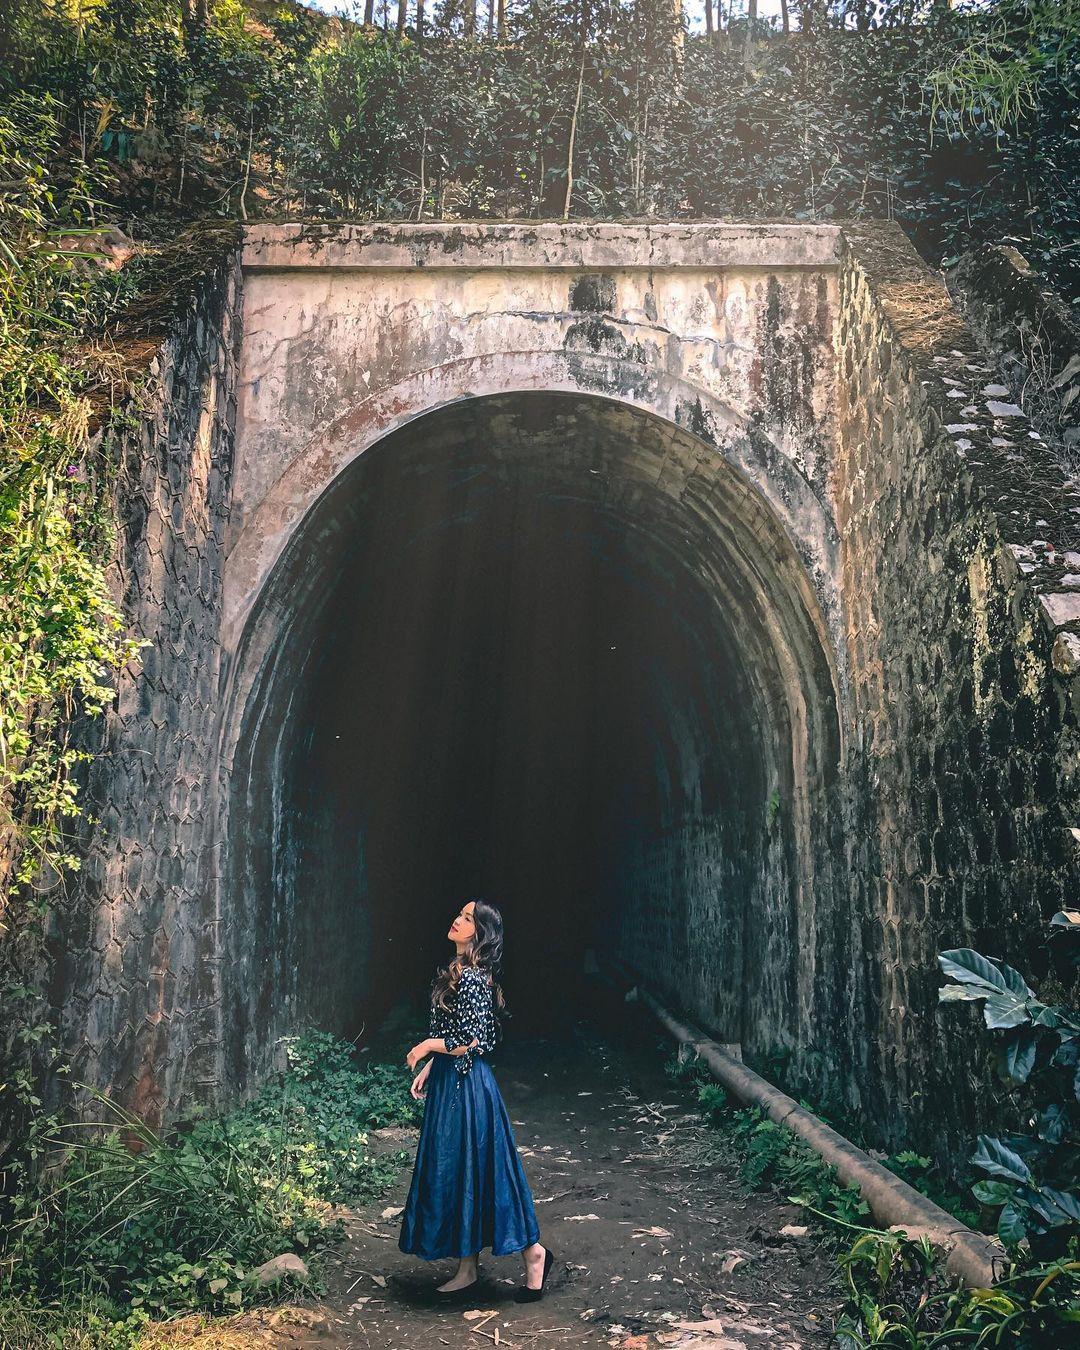 beautiful abandoned places - Da Lat railway tunnel